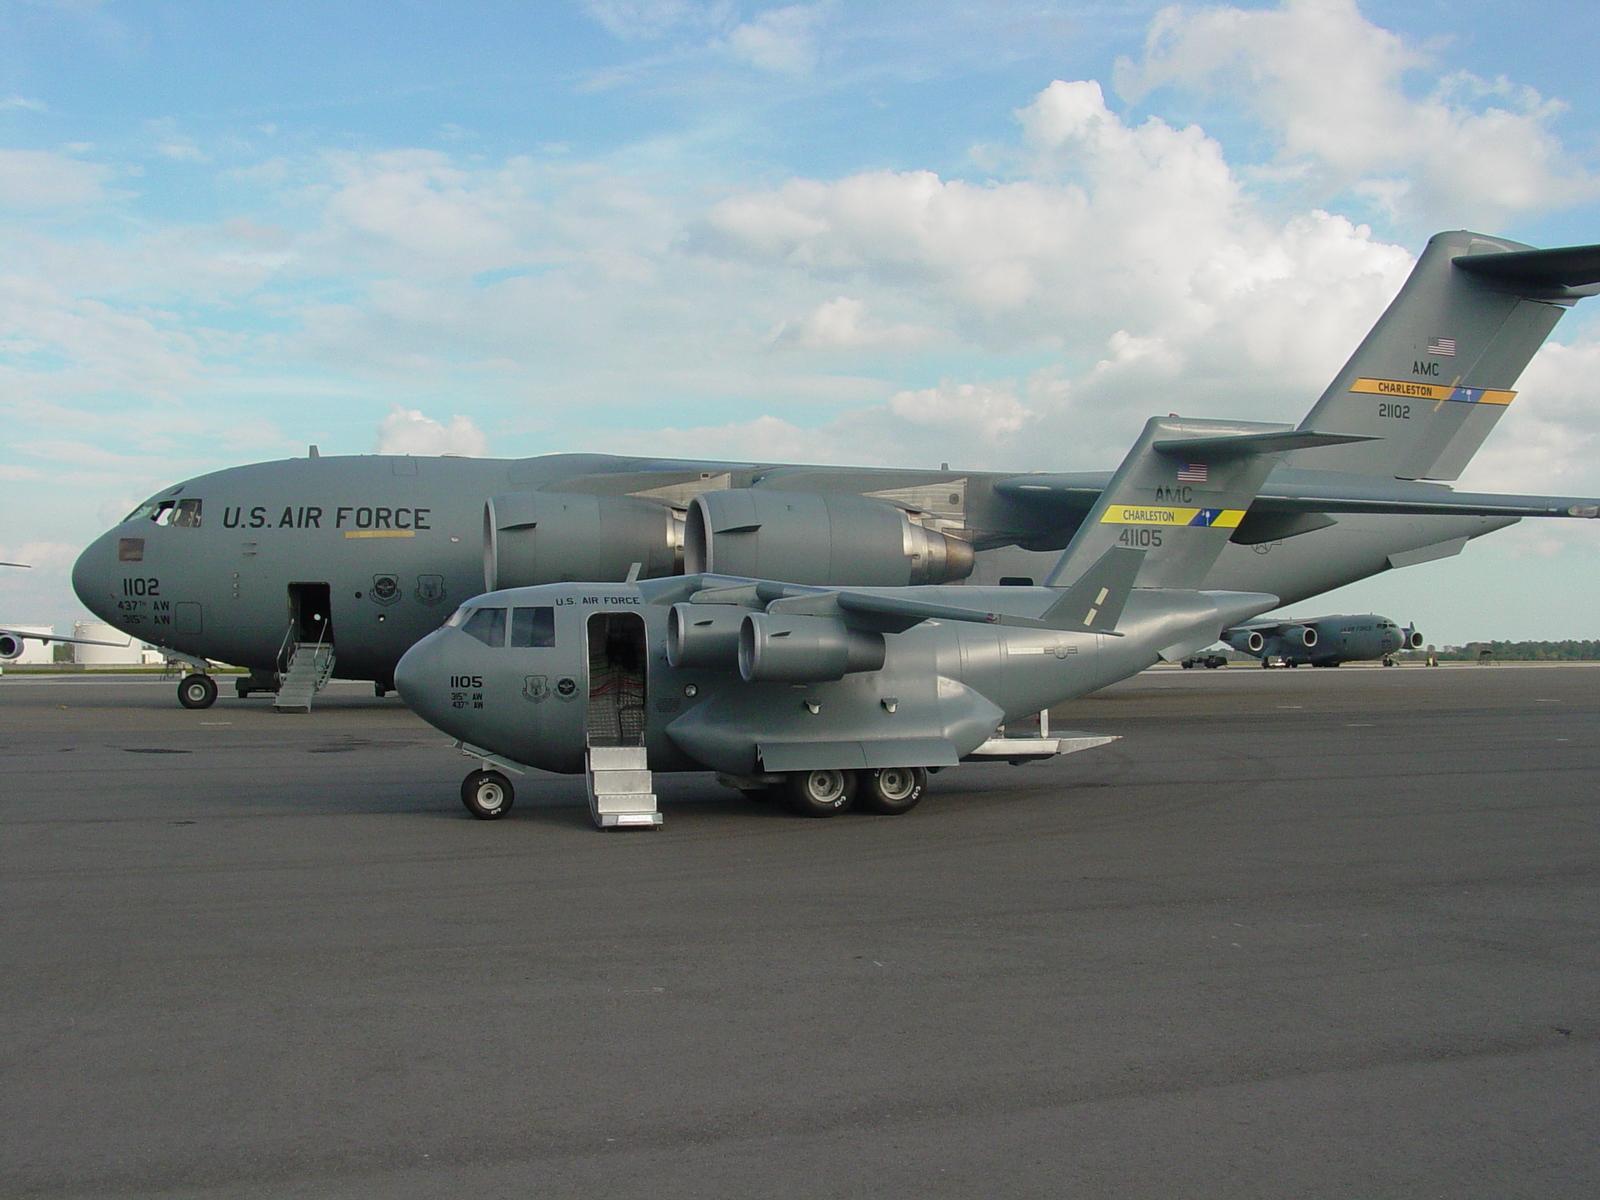 DOWNLOAD HI-RES / PHOTO DETAILS. The Mini C-17 ...